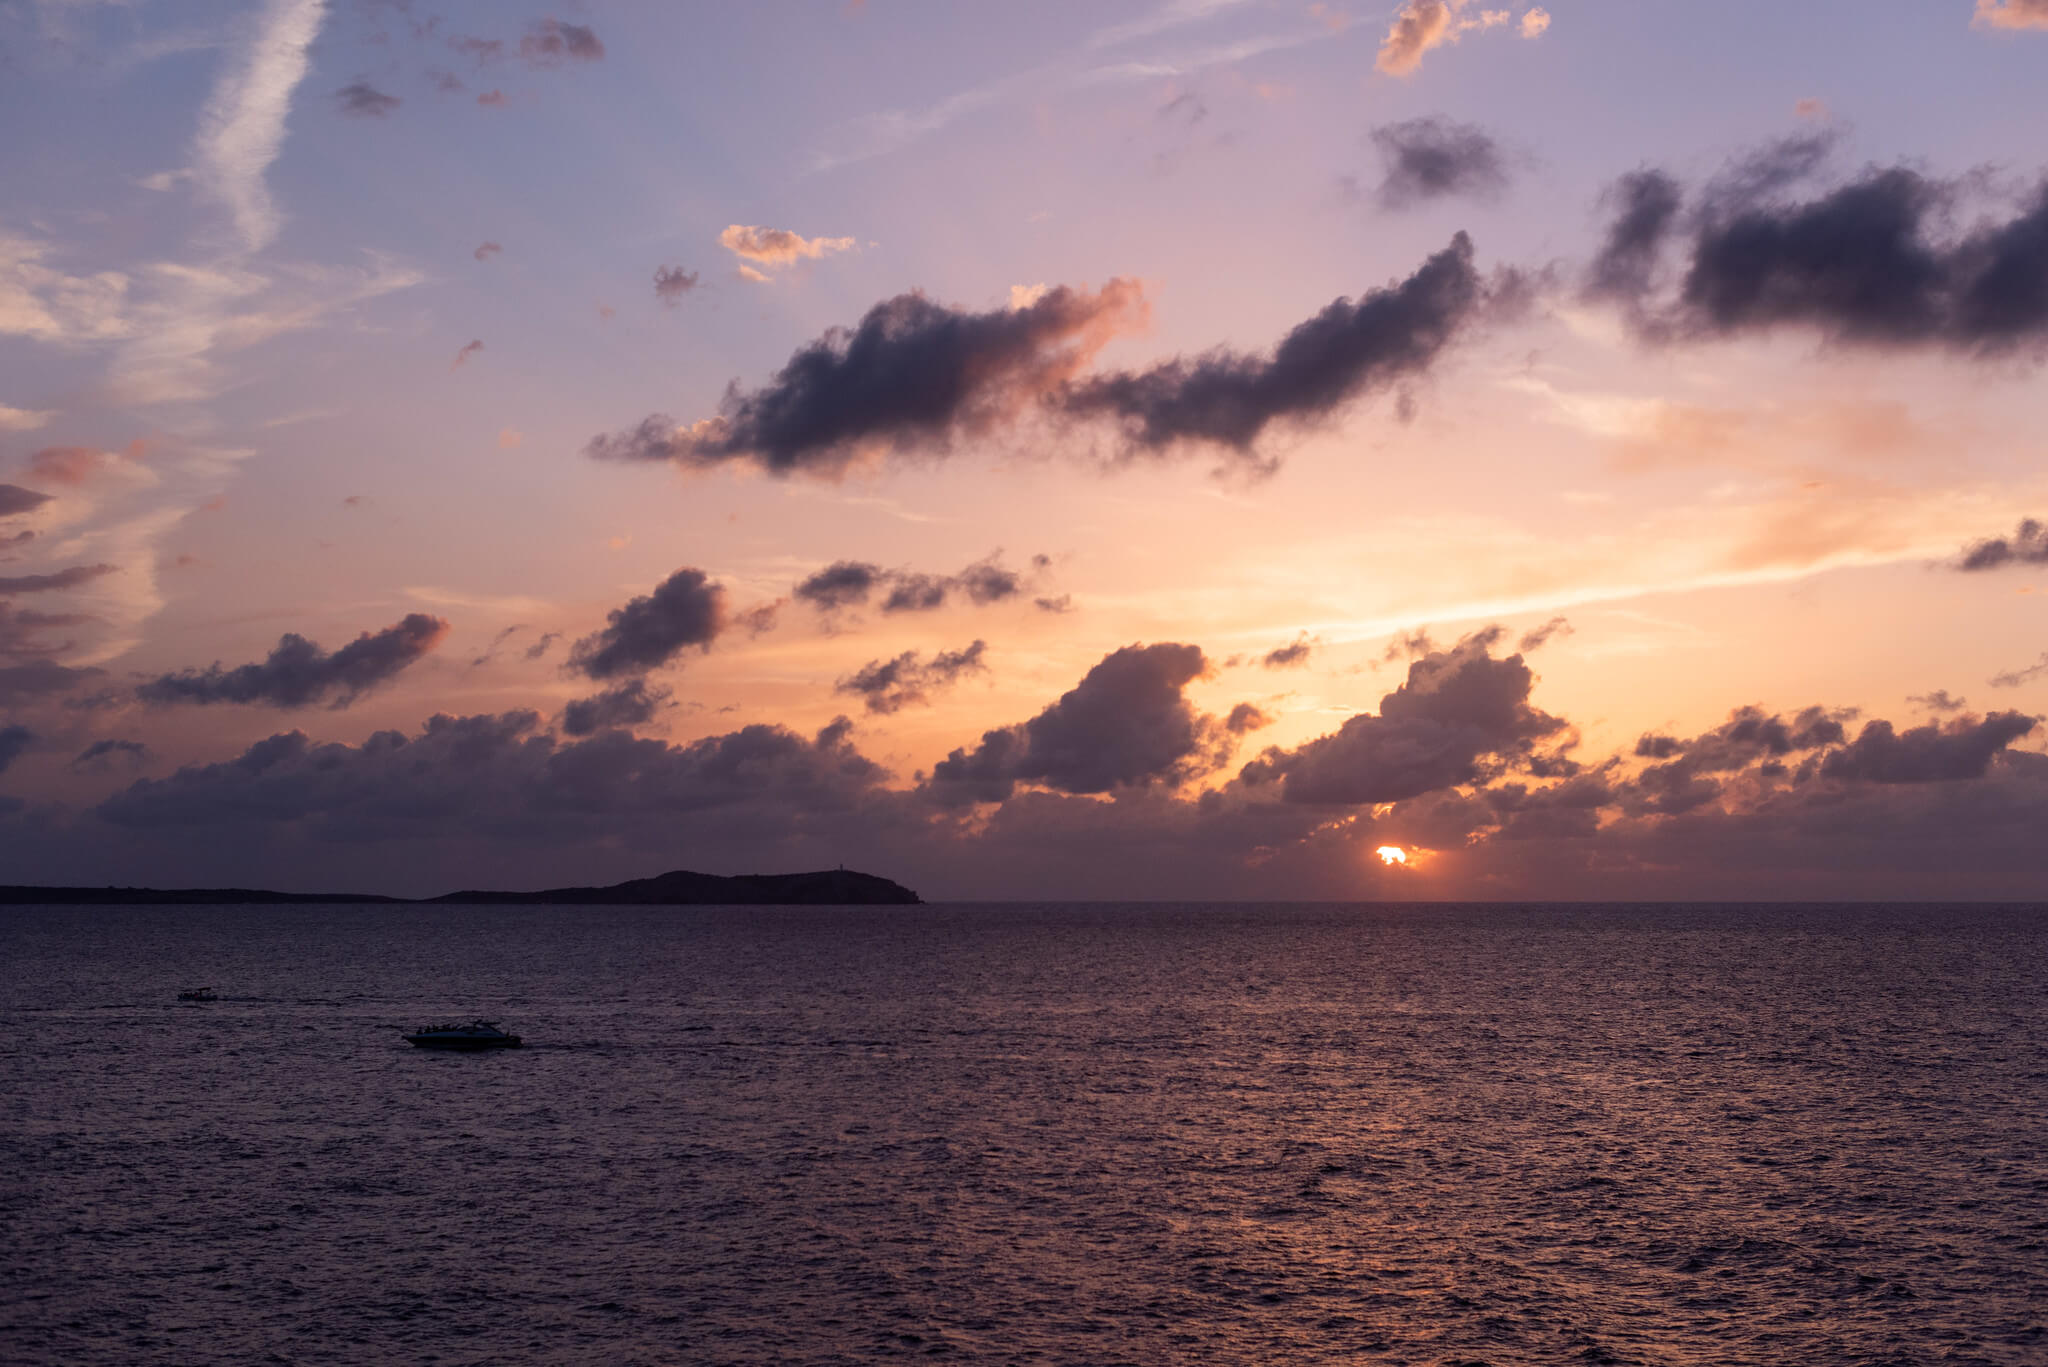 https://www.white-ibiza.com/wp-content/uploads/2020/03/ibiza-sunsets-la-torre-ibiza-2020-05.jpg